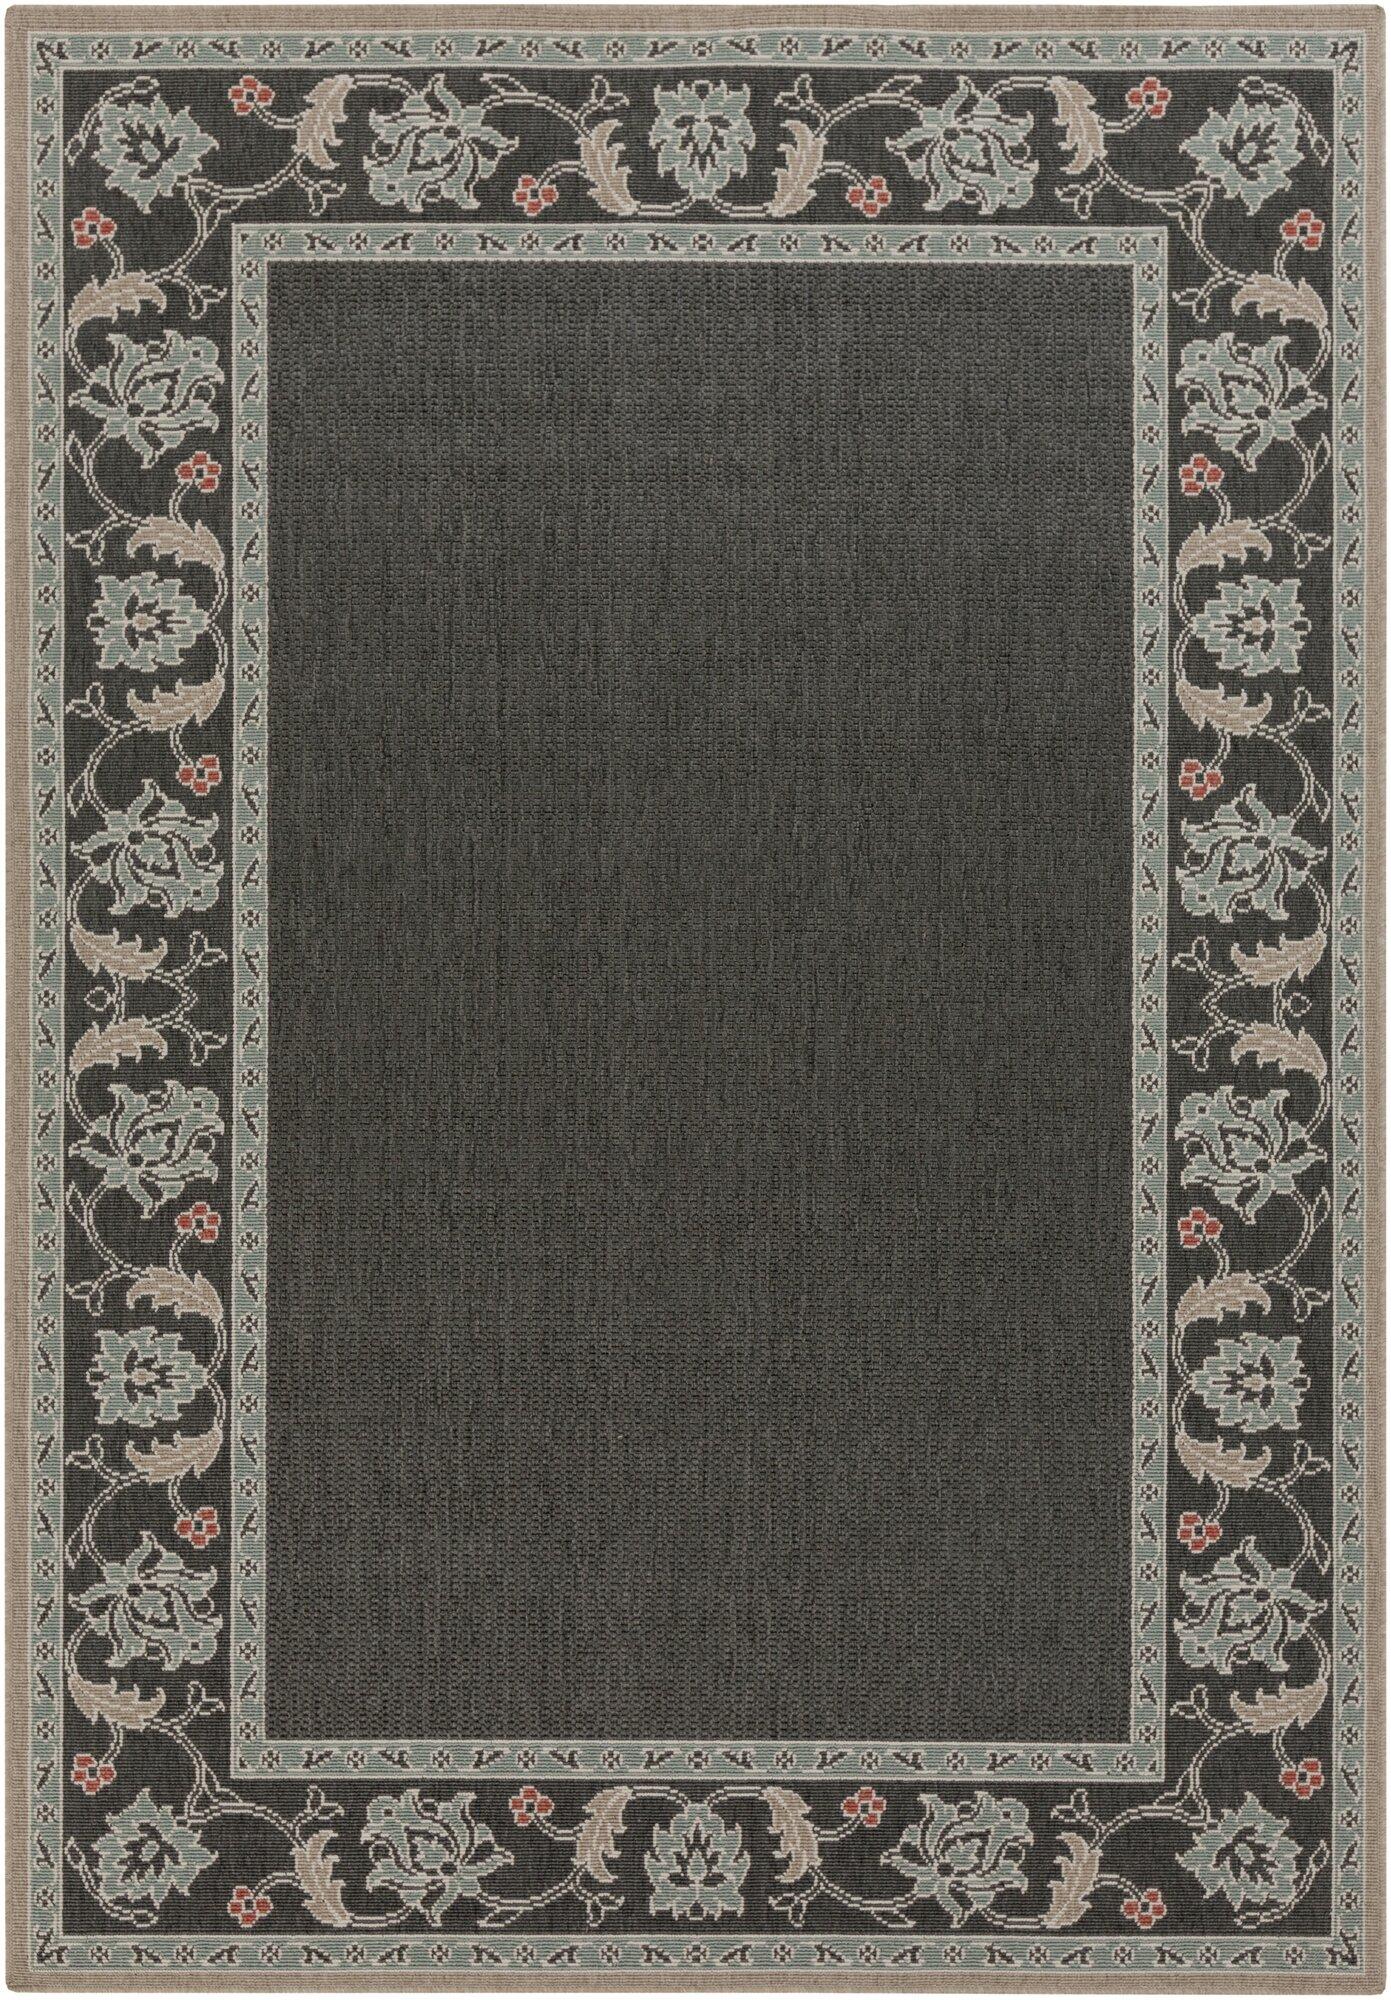 surya alfresco black gray solid area rug. Black Bedroom Furniture Sets. Home Design Ideas